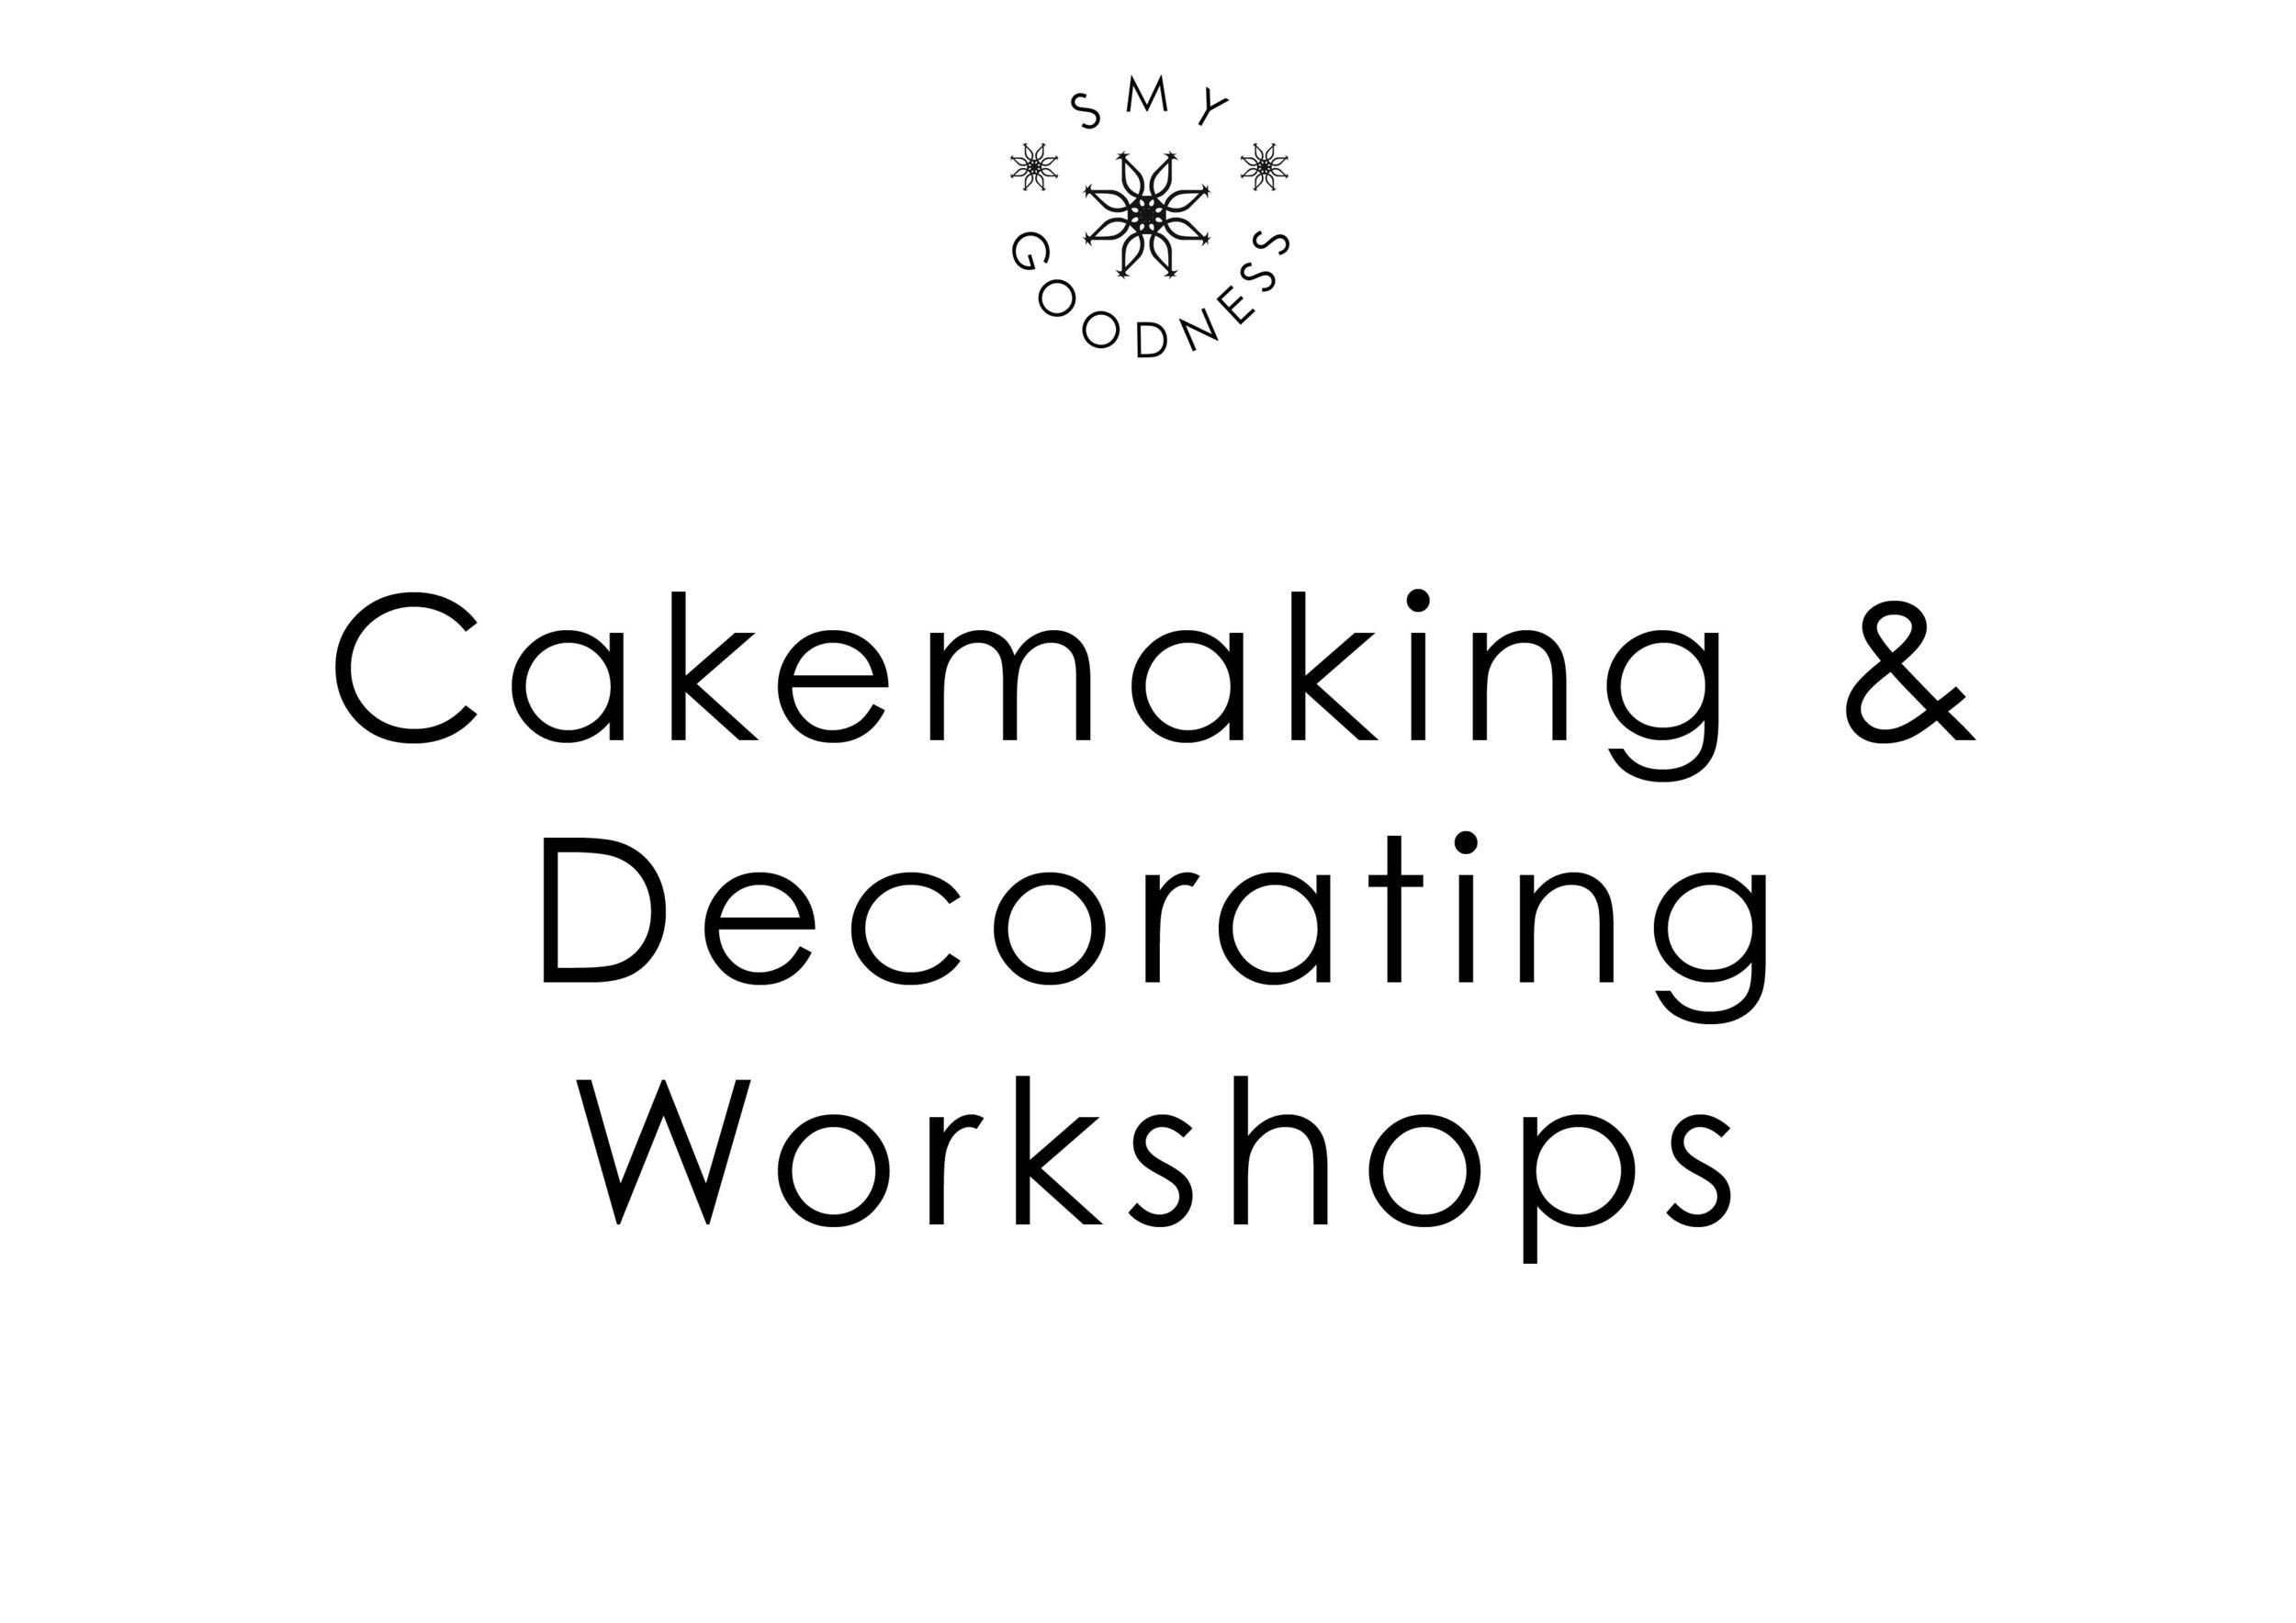 Cake Making and Decorating Workshop